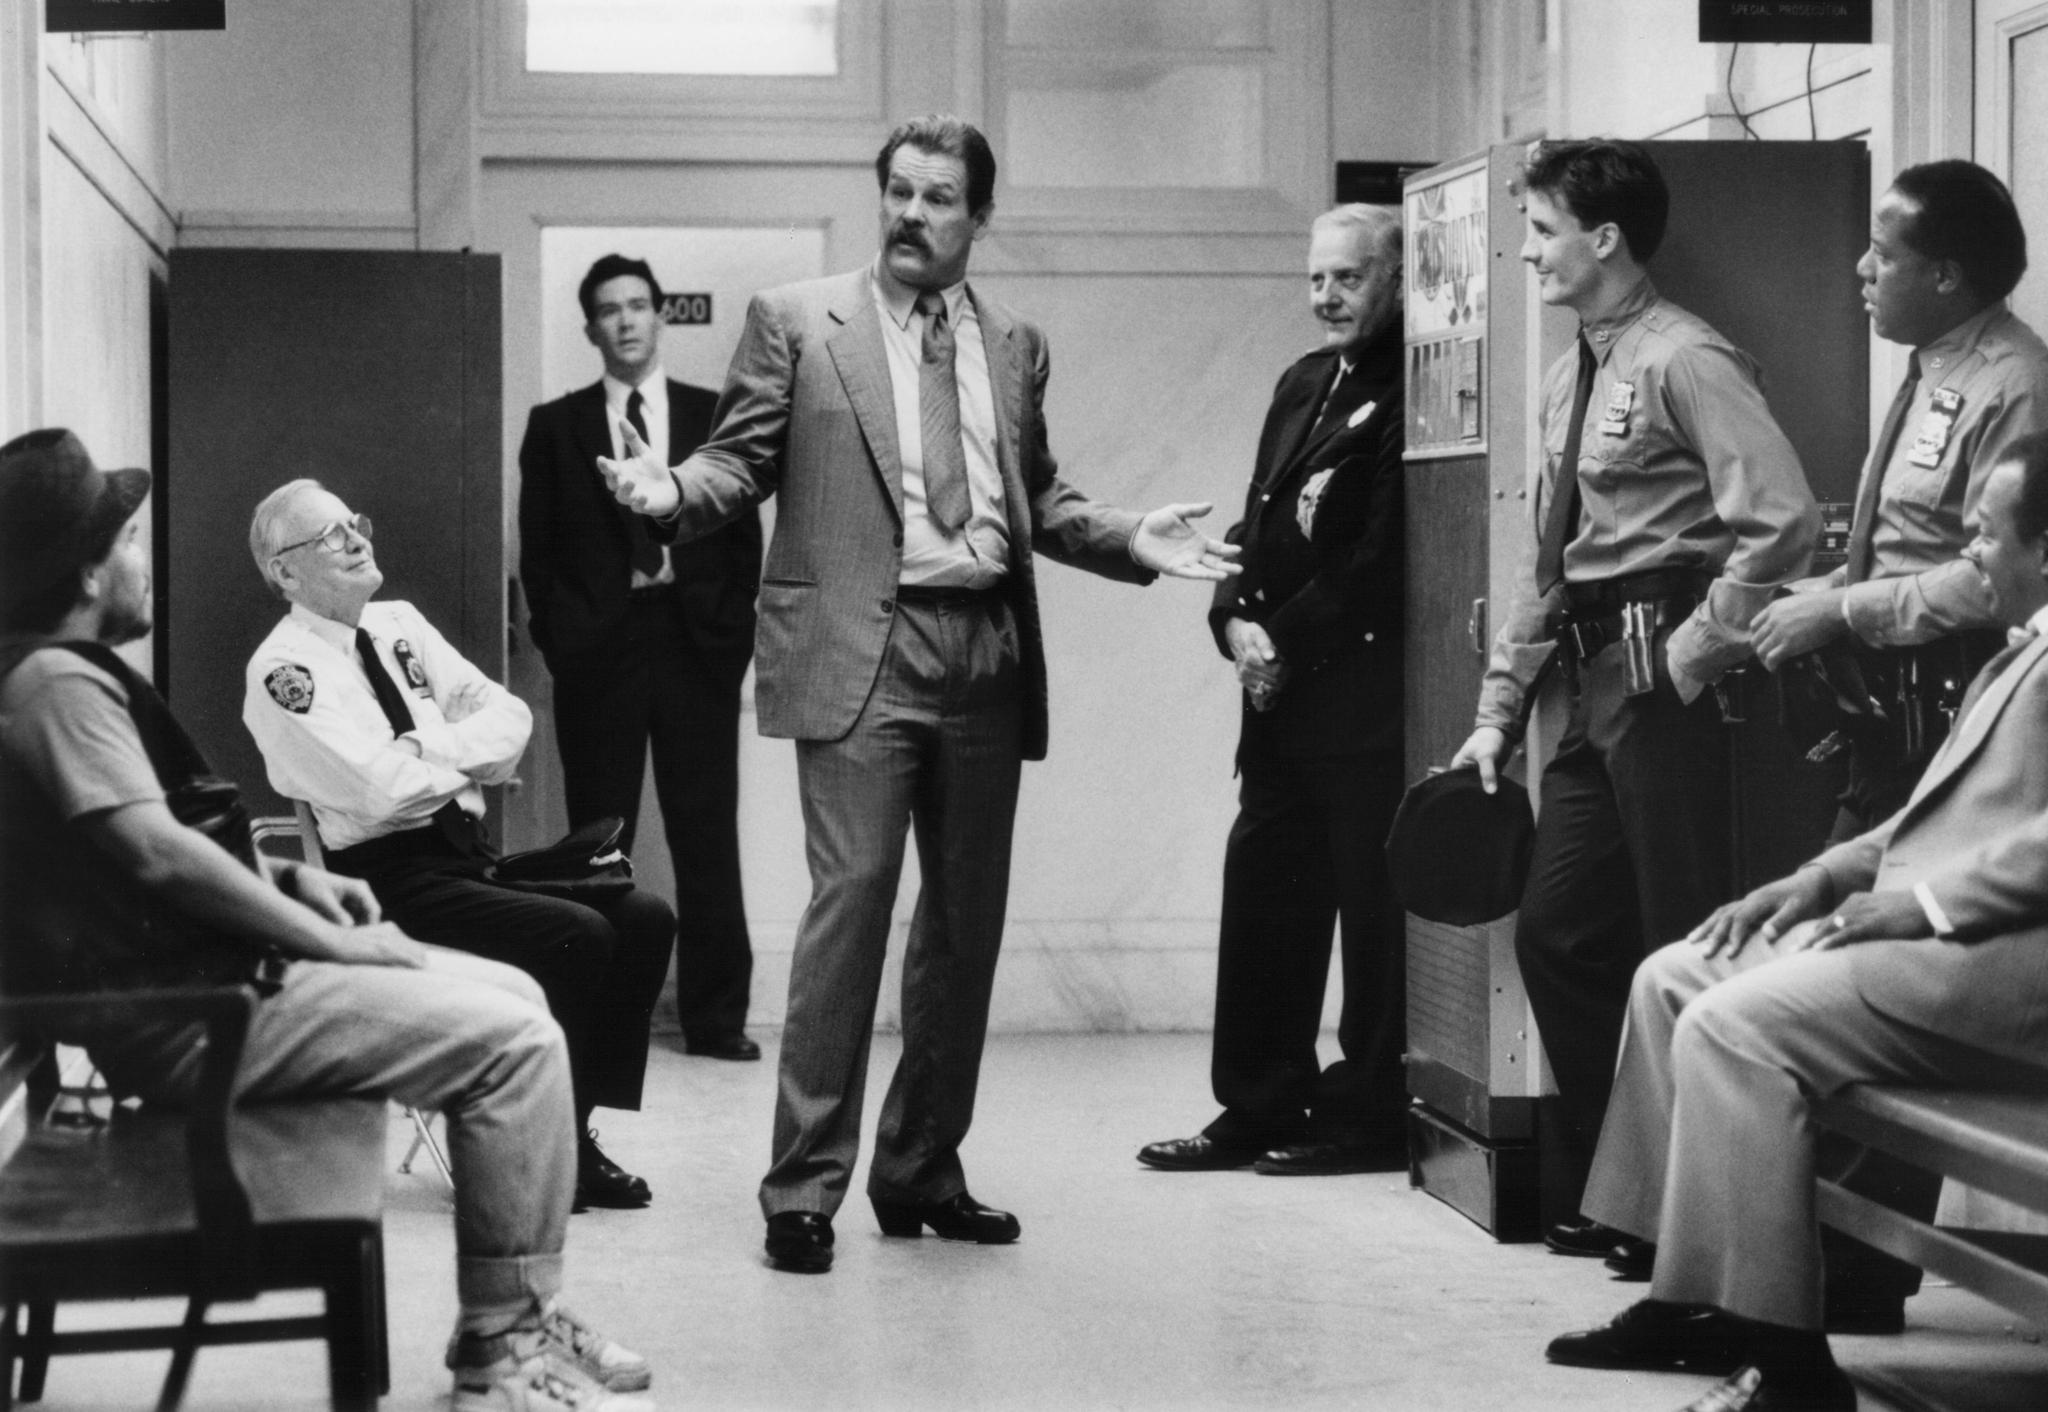 Timothy Hutton, Nick Nolte, and Luis Guzmán in Q & A (1990)